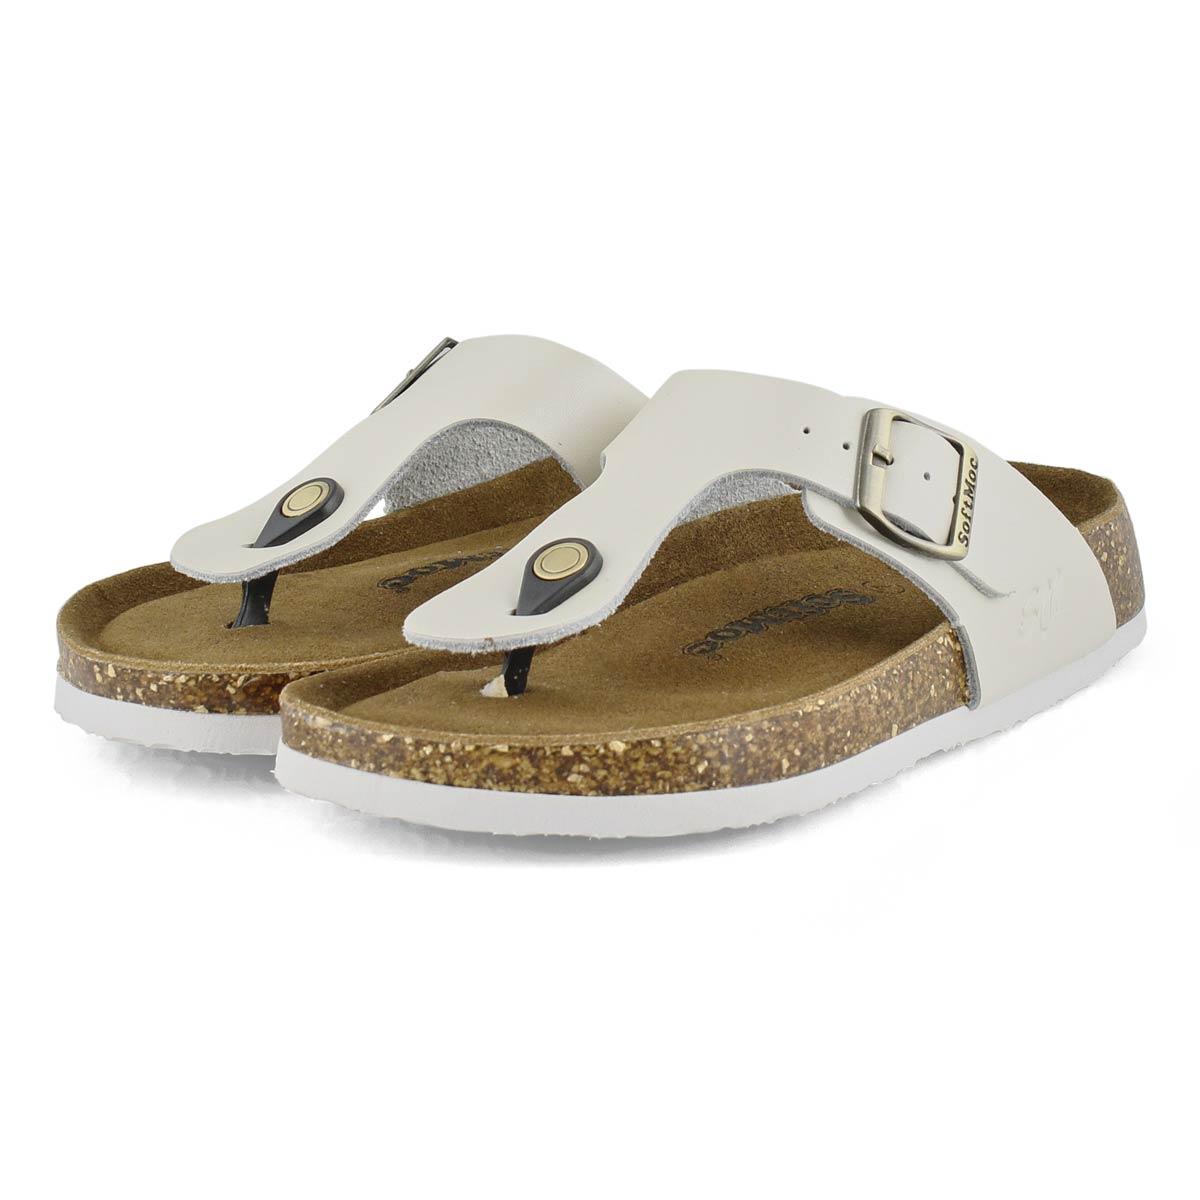 Lds Angy 5 prl wht mem foam thong sandal